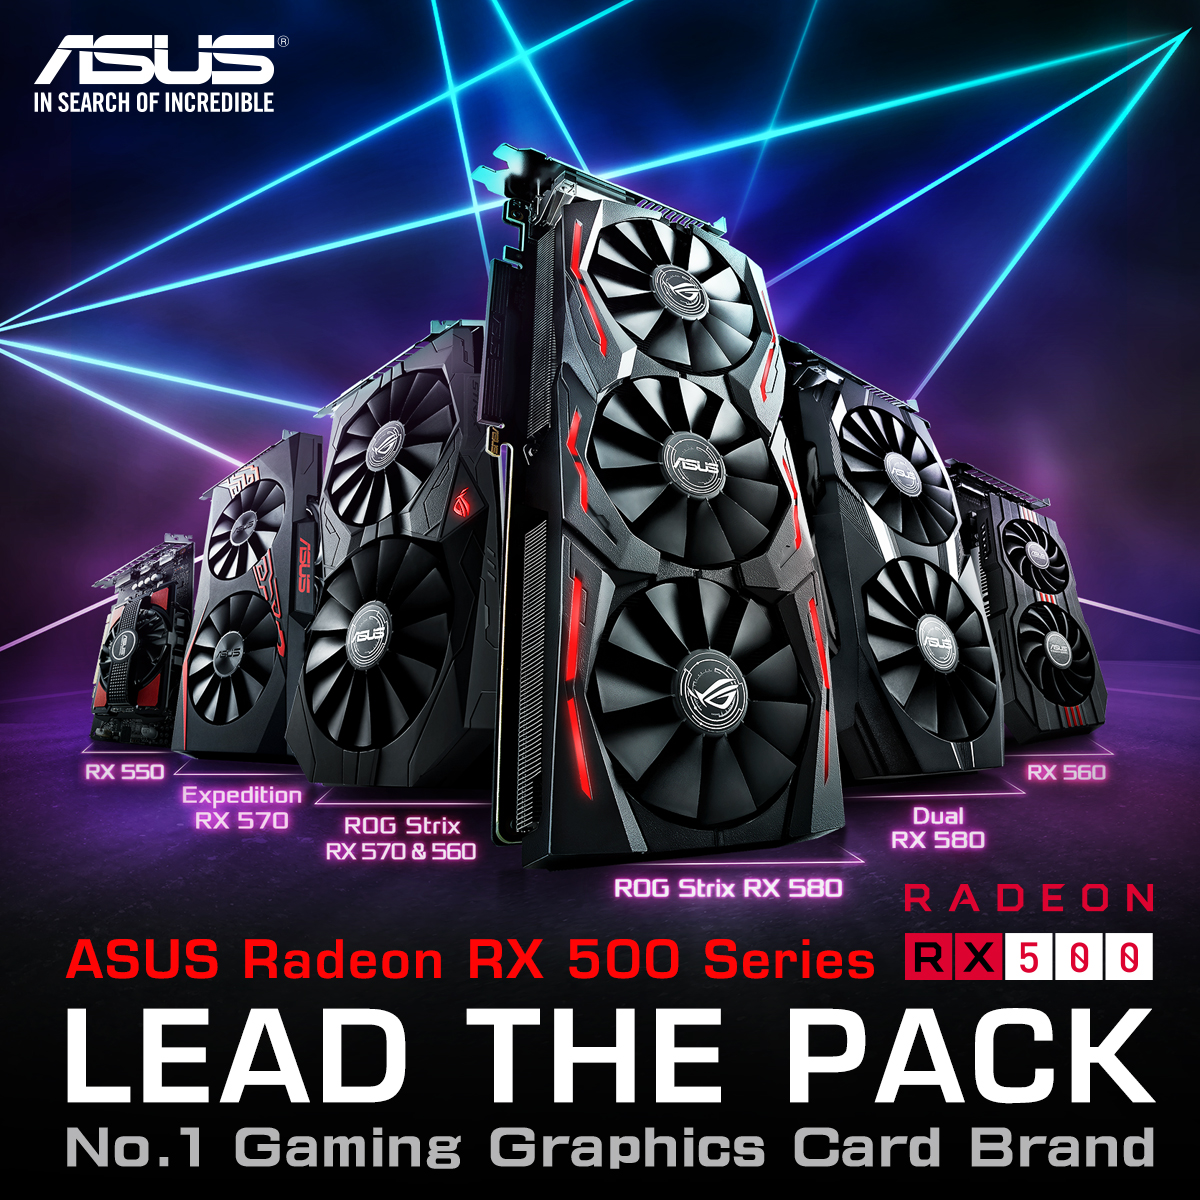 ASUS Radeon RX 500 Series